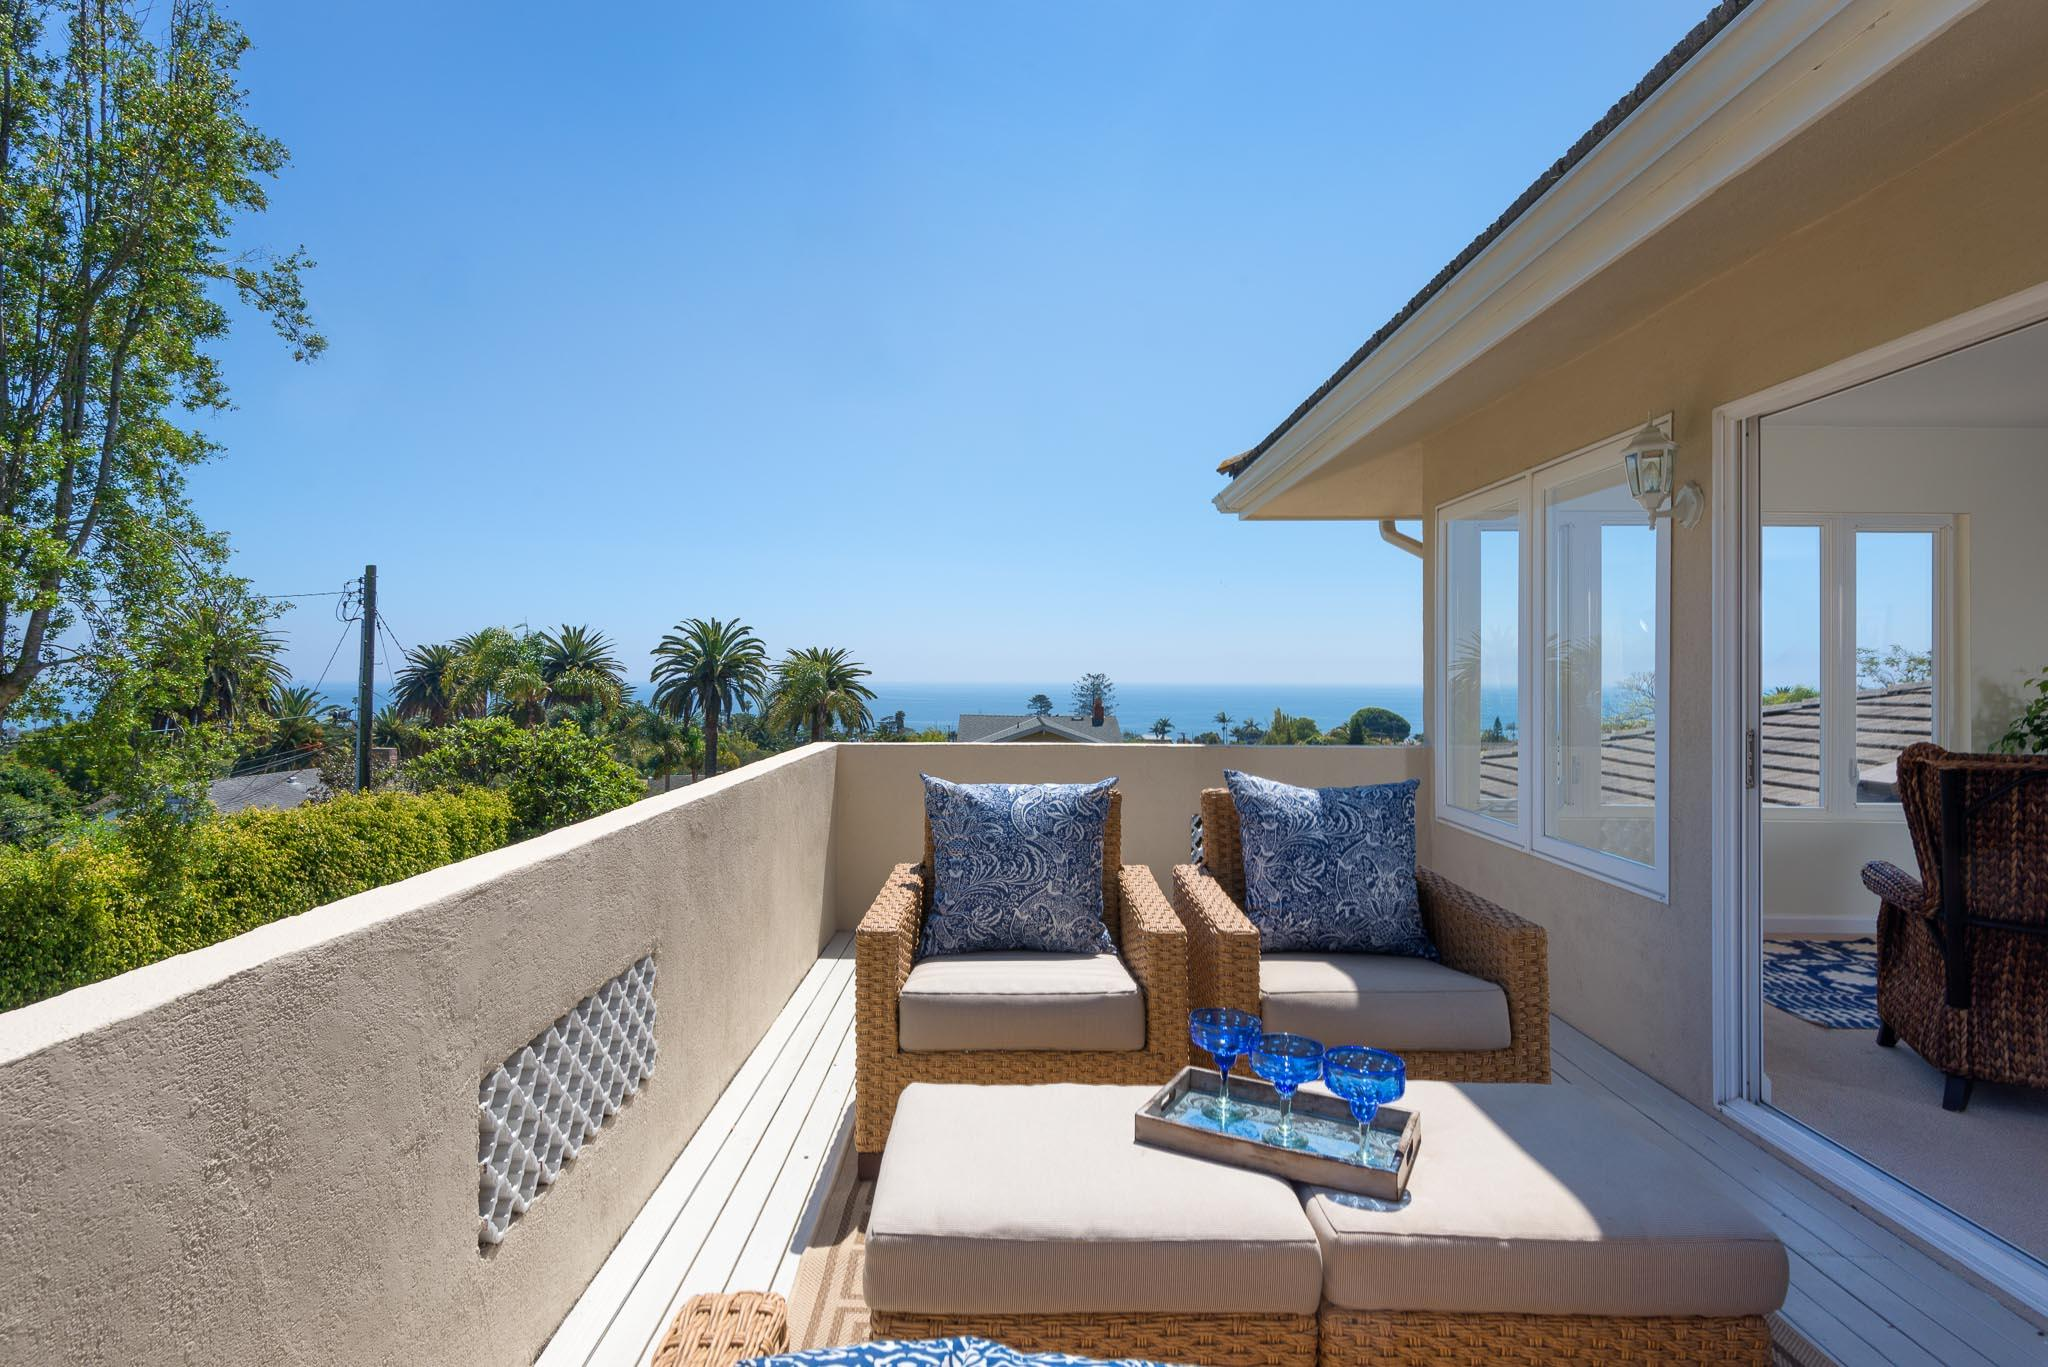 Property photo for 1522 San Miguel Ave Santa Barbara, California 93109 - 17-1118